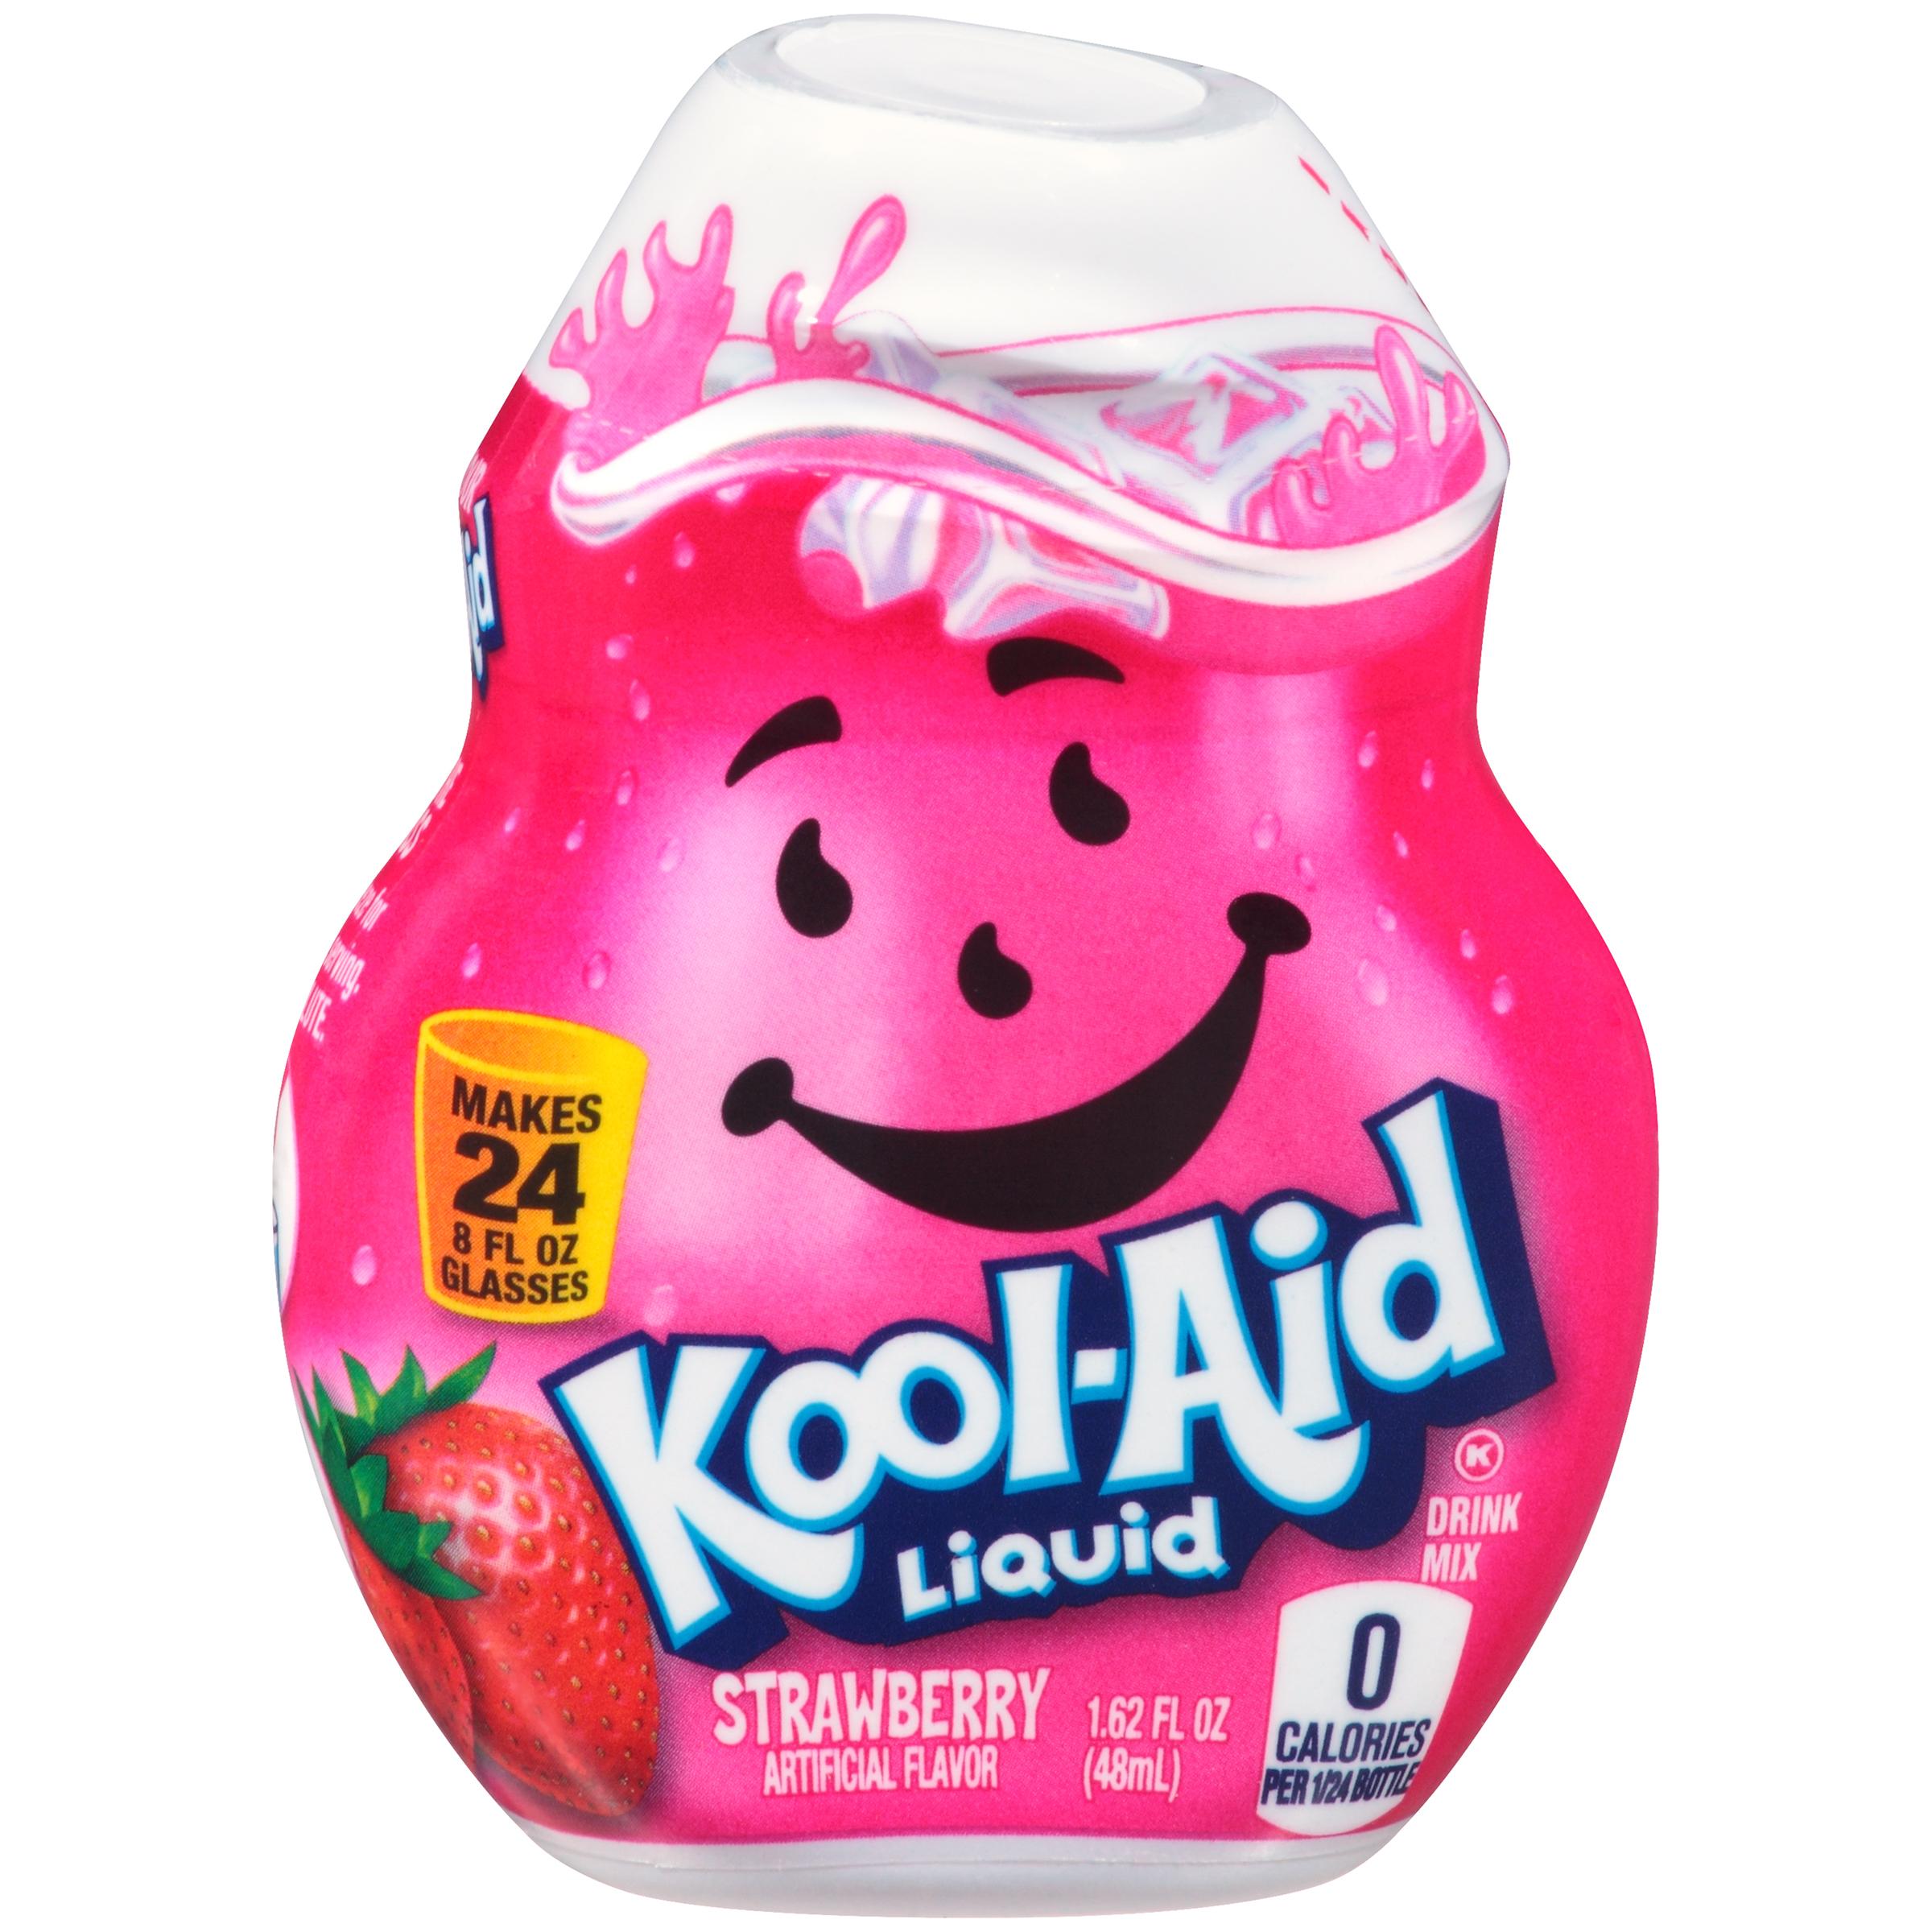 KOOL-AID Strawberry Liquid Drink Mix 1.62 fl oz Bottle image